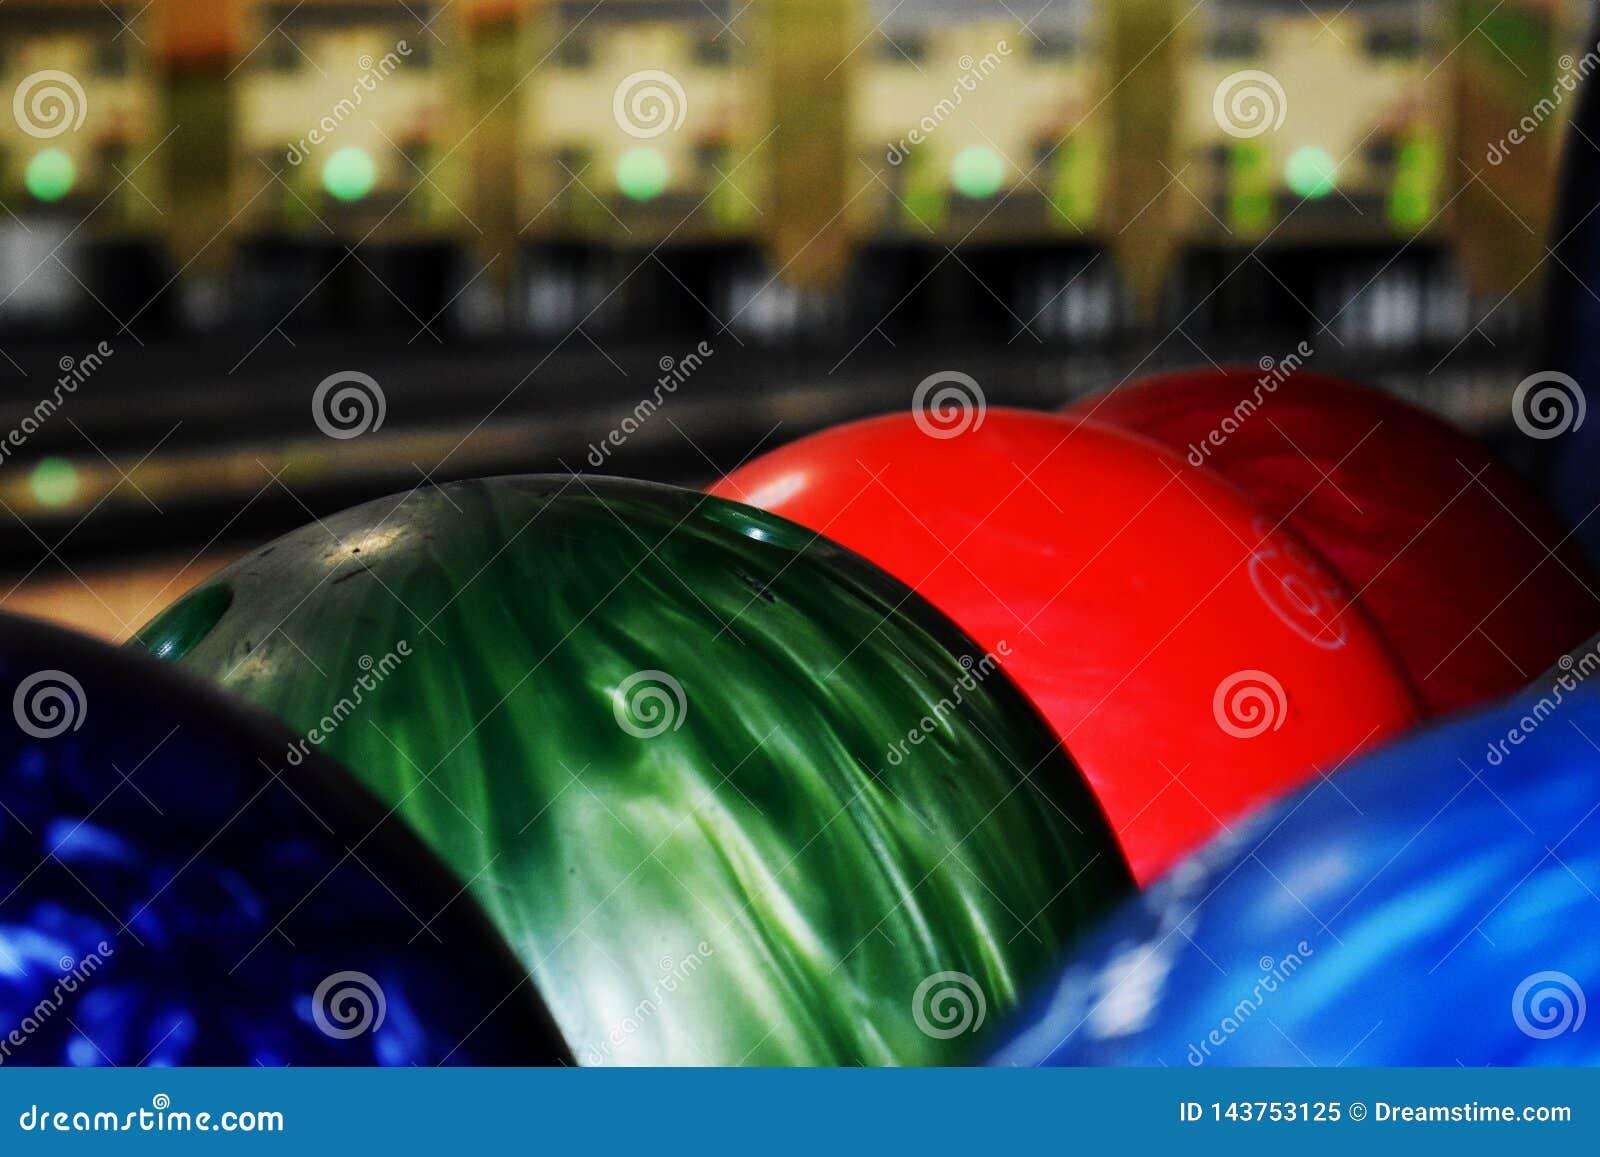 Red green blue bowling balls